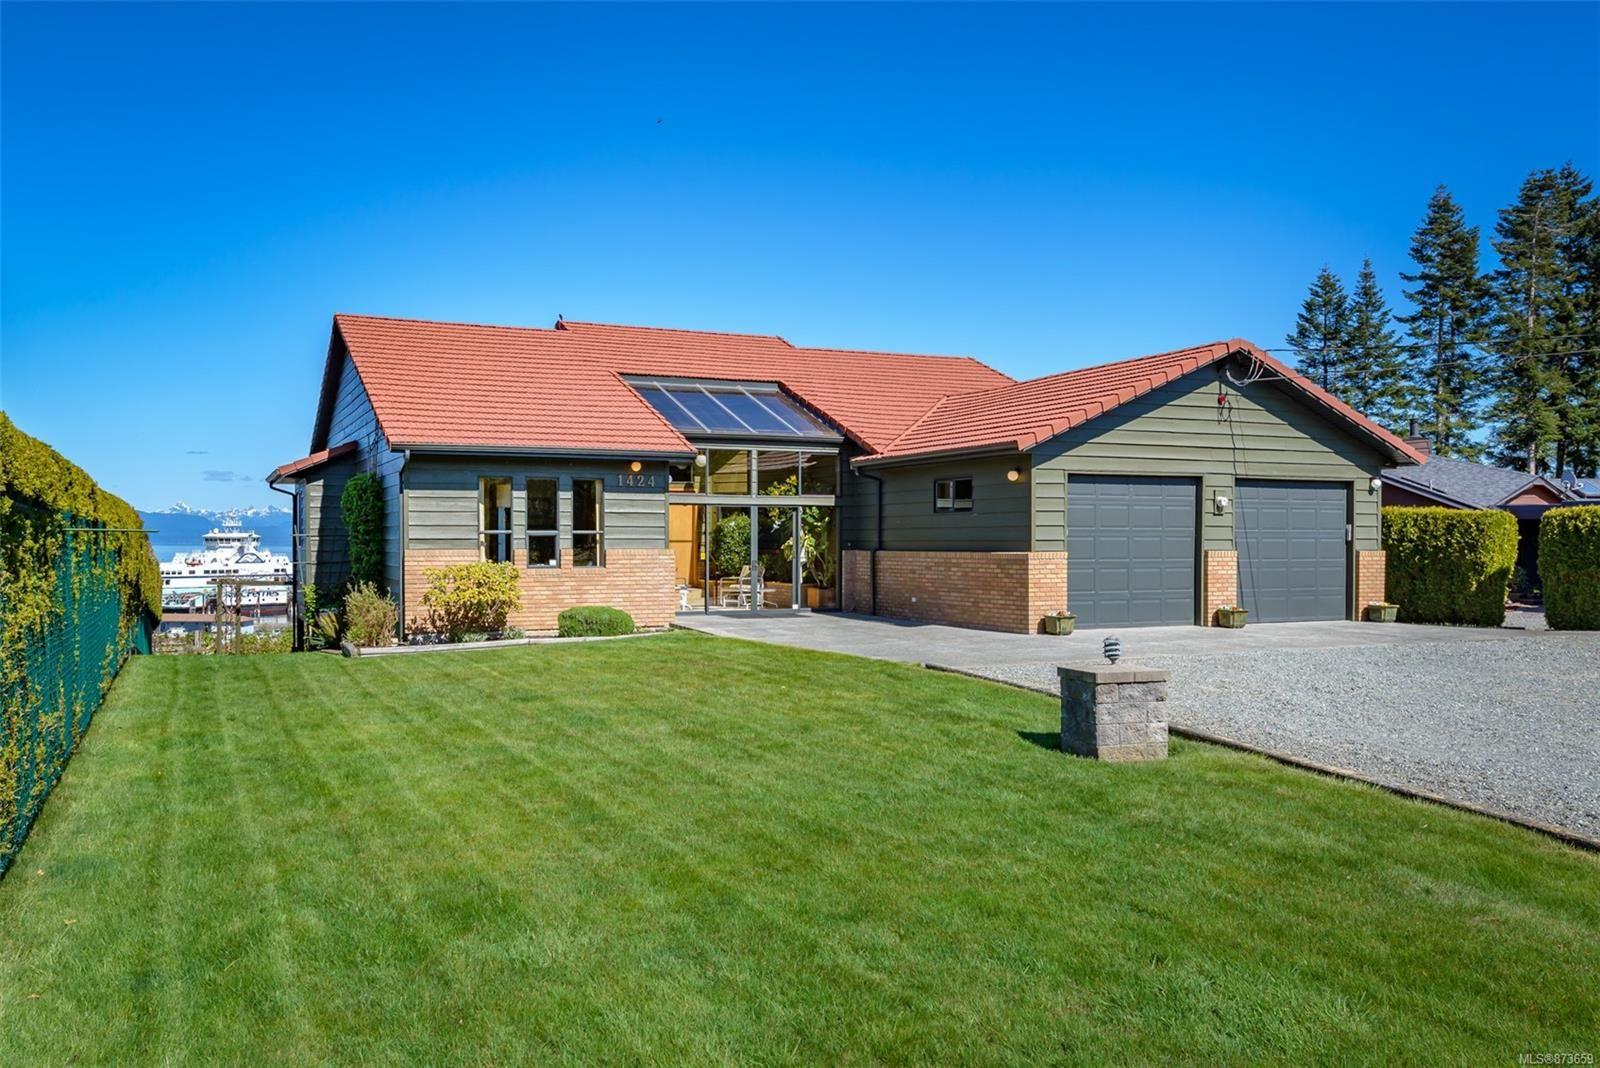 Main Photo: 1424 Jackson Dr in : CV Comox Peninsula House for sale (Comox Valley)  : MLS®# 873659